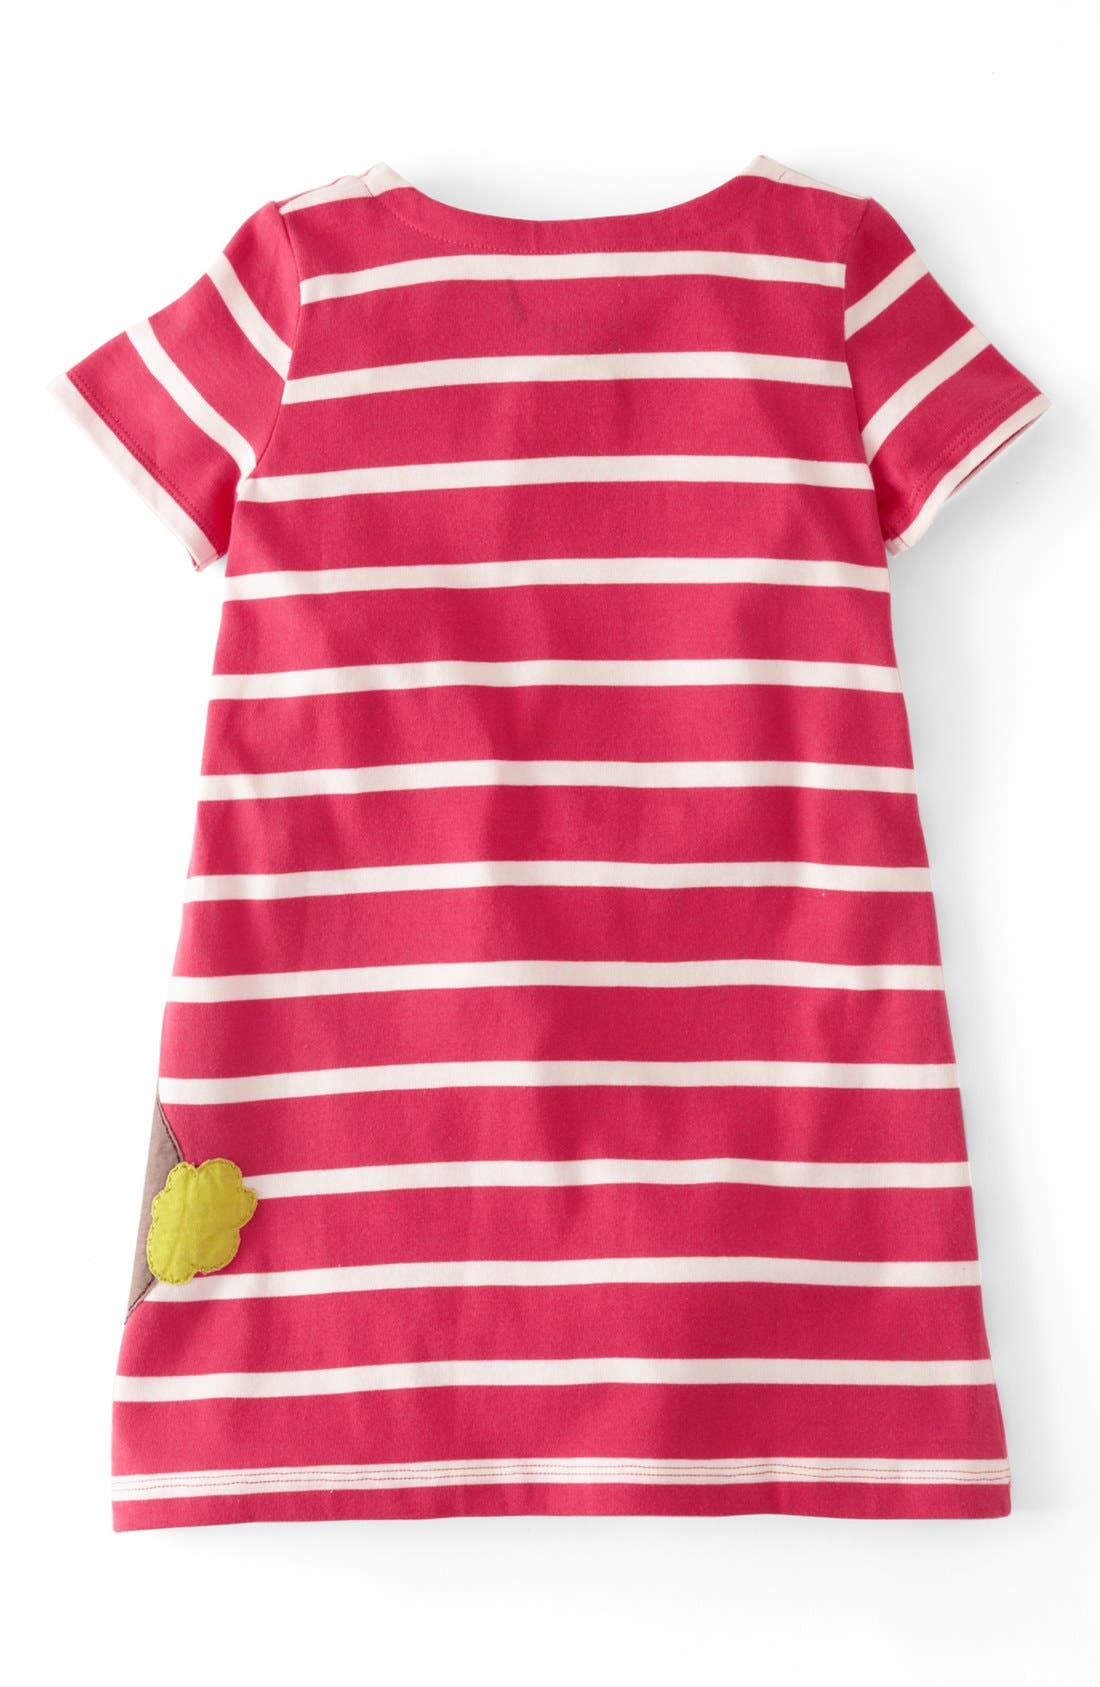 Alternate Image 2  - Mini Boden Appliqué Dress (Toddler Girls, Little Girls & Big Girls)